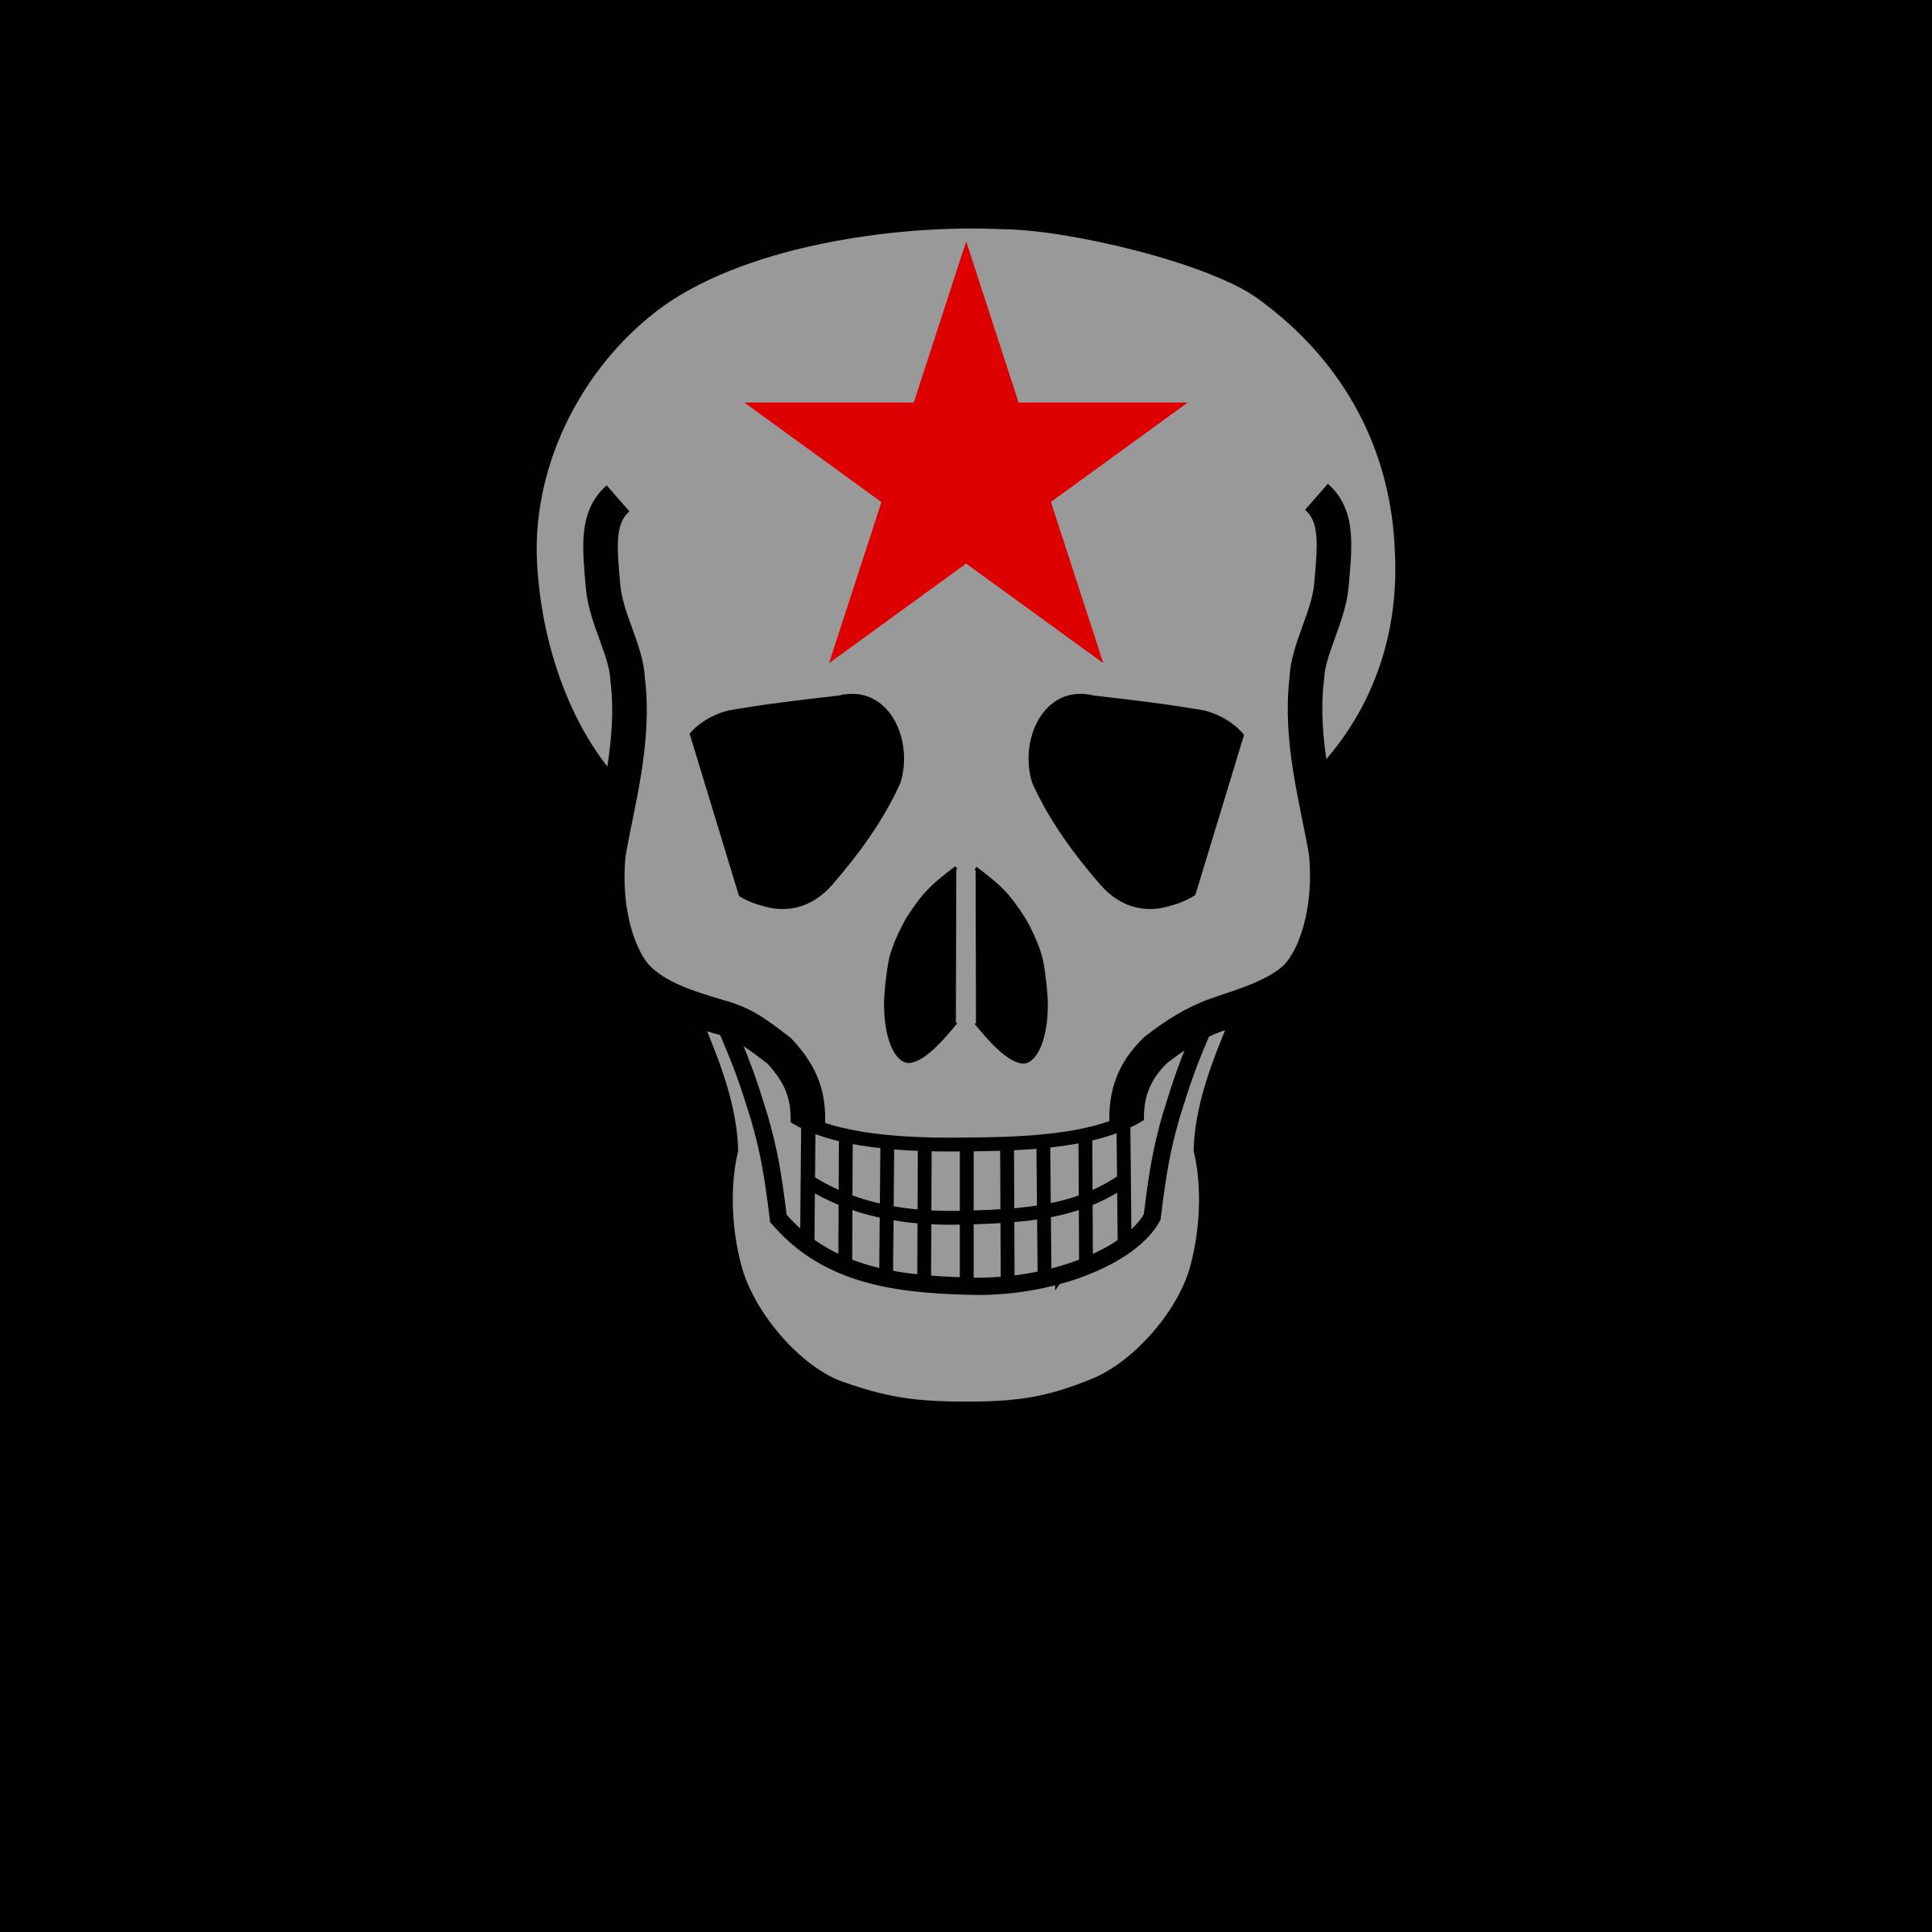 Pistol clipart baril. Skull and crossed guns